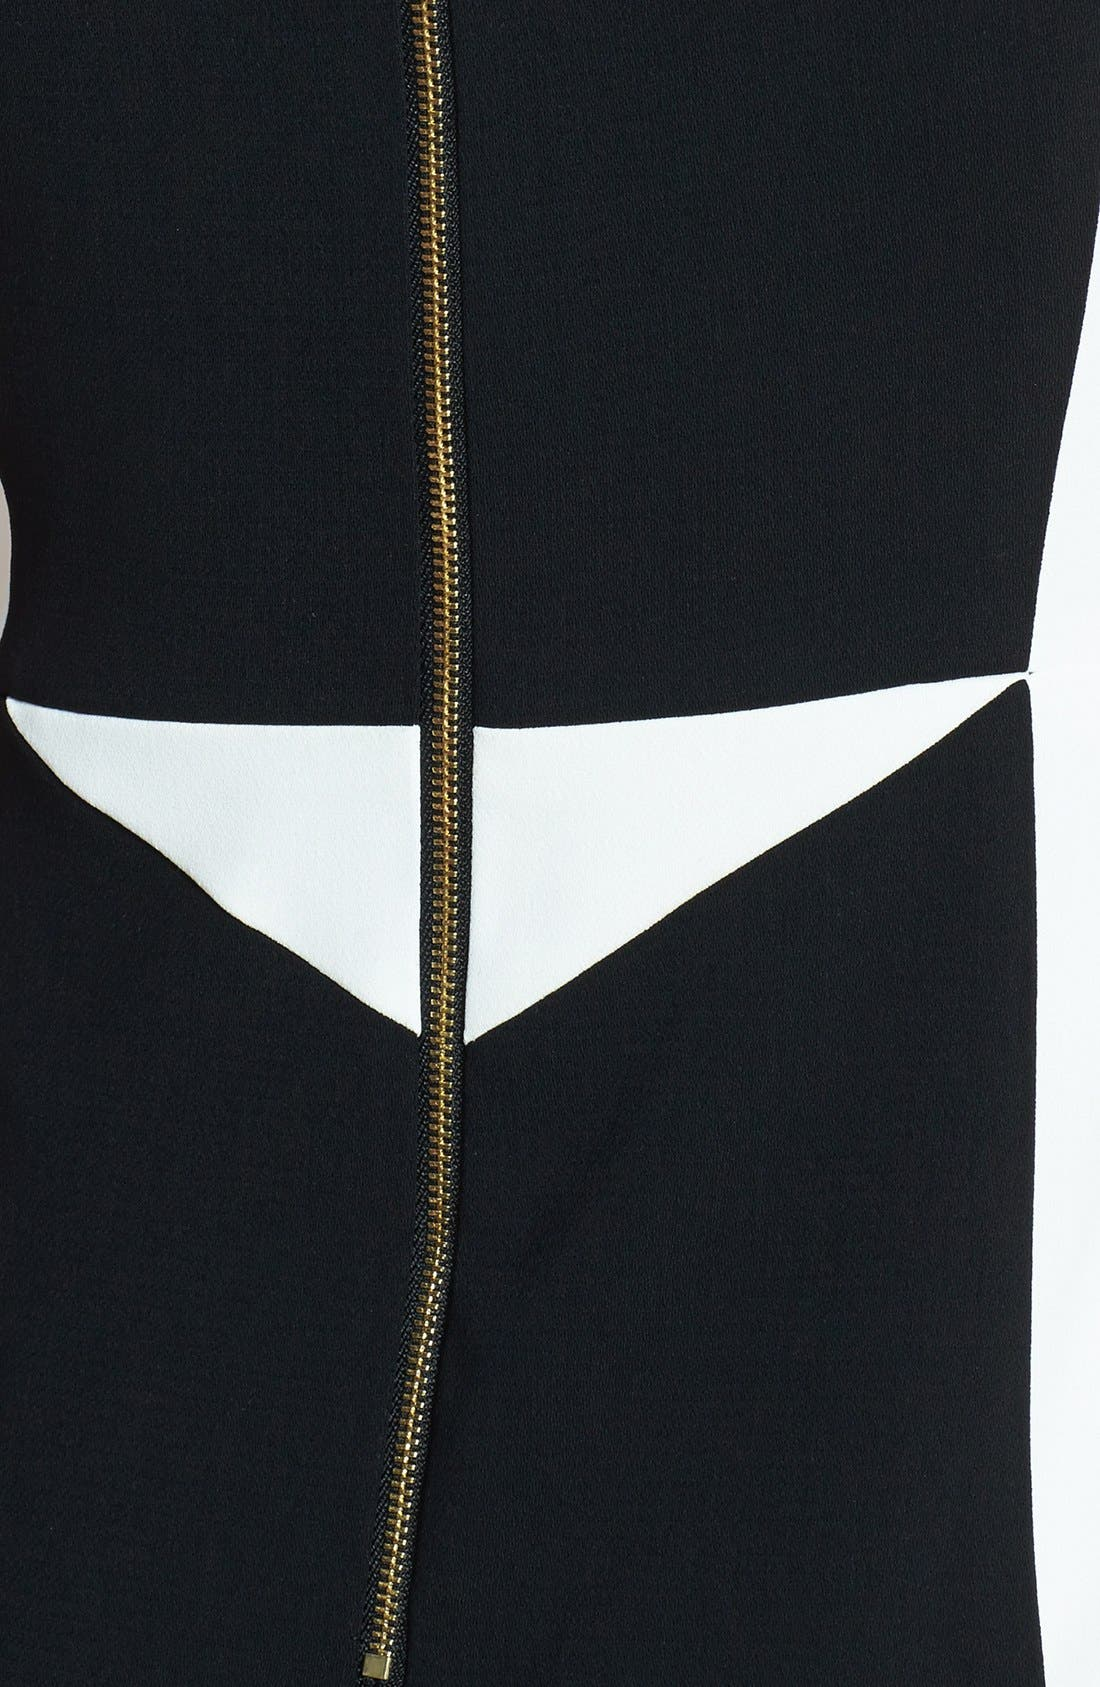 Colorblock Sheath Dress,                             Alternate thumbnail 4, color,                             001